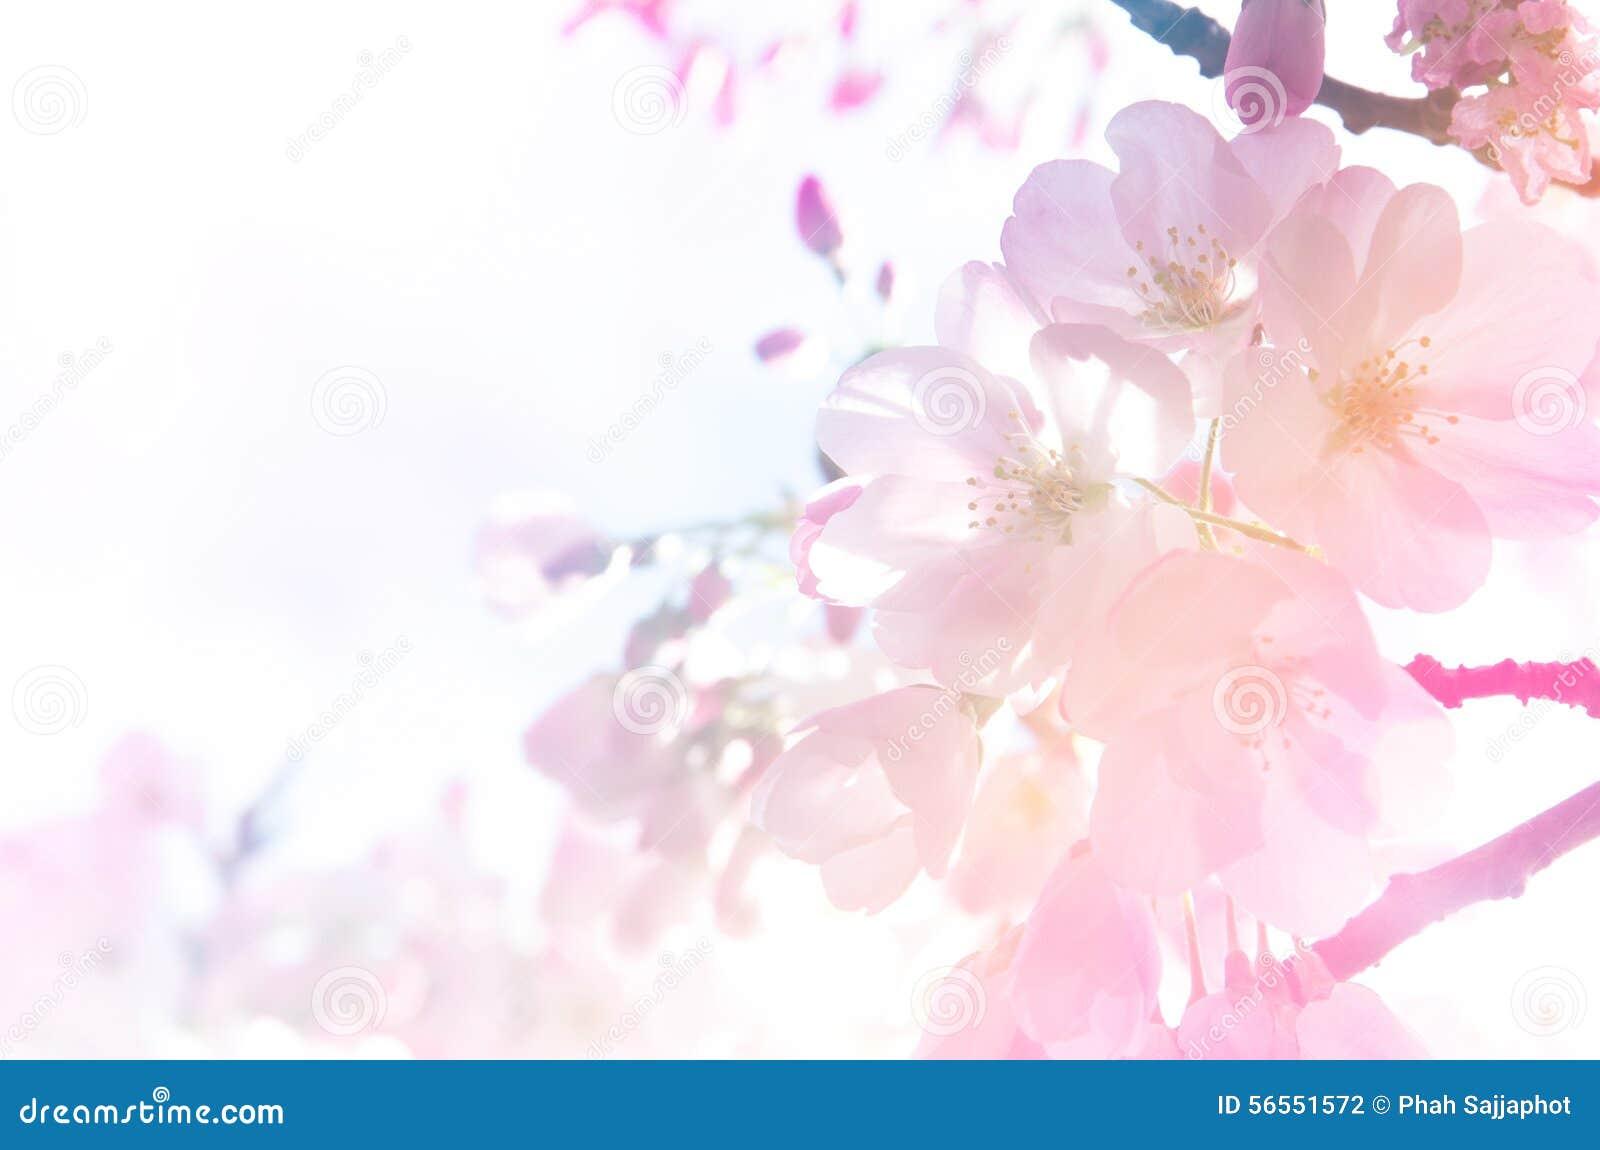 Download Υπόβαθρο ανθών κερασιών στο φως κλίσης Στοκ Εικόνες - εικόνα από ροζ, floral: 56551572